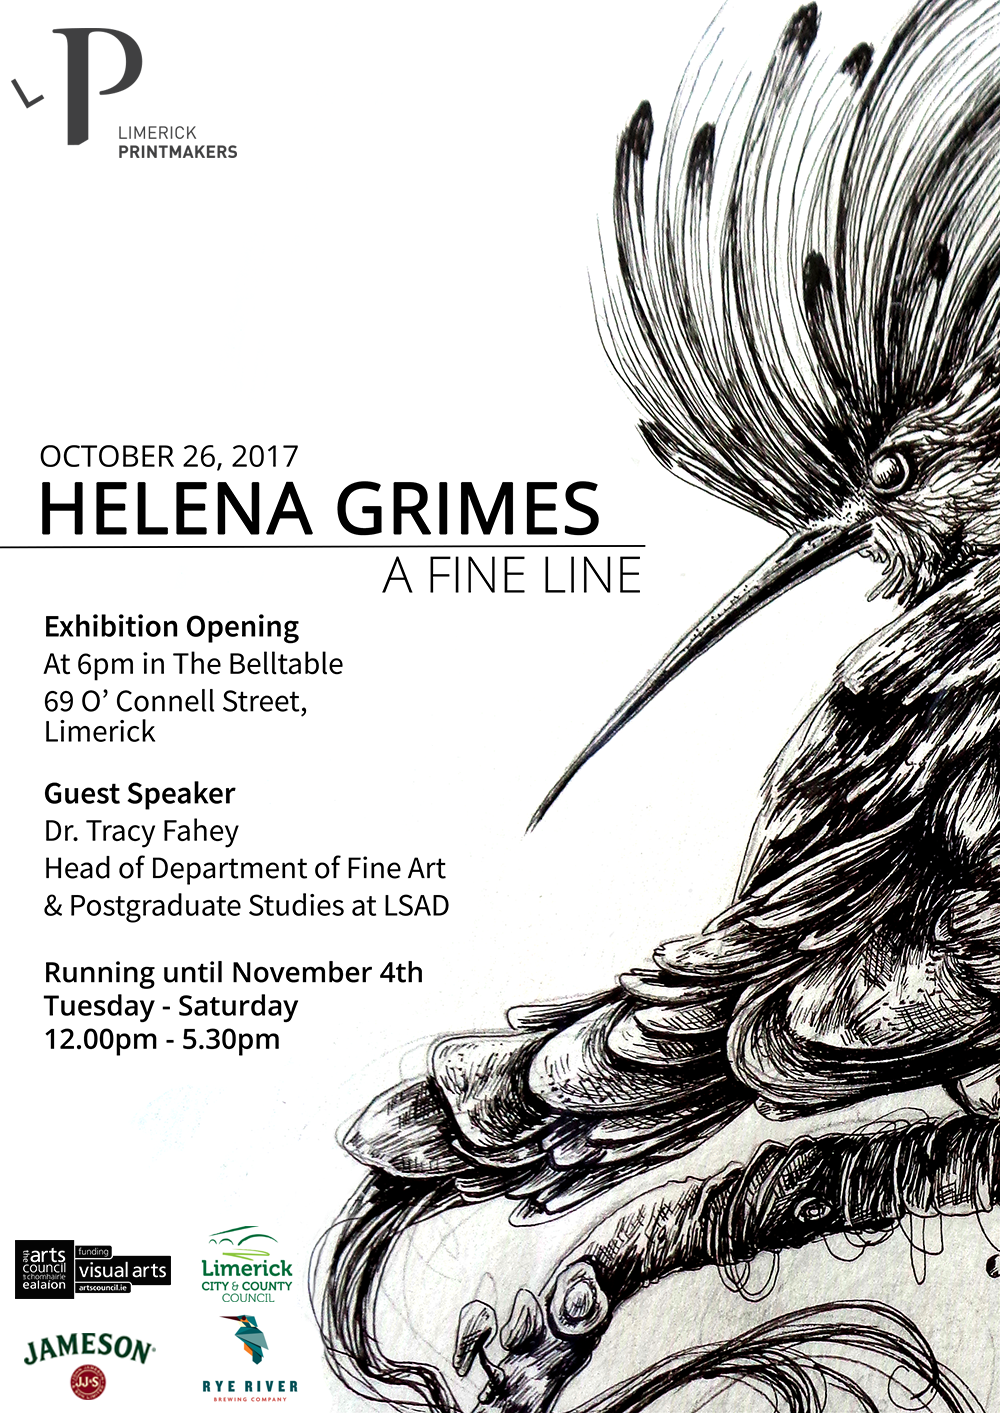 a_fine_line_by_helena_grimes_irish_artist